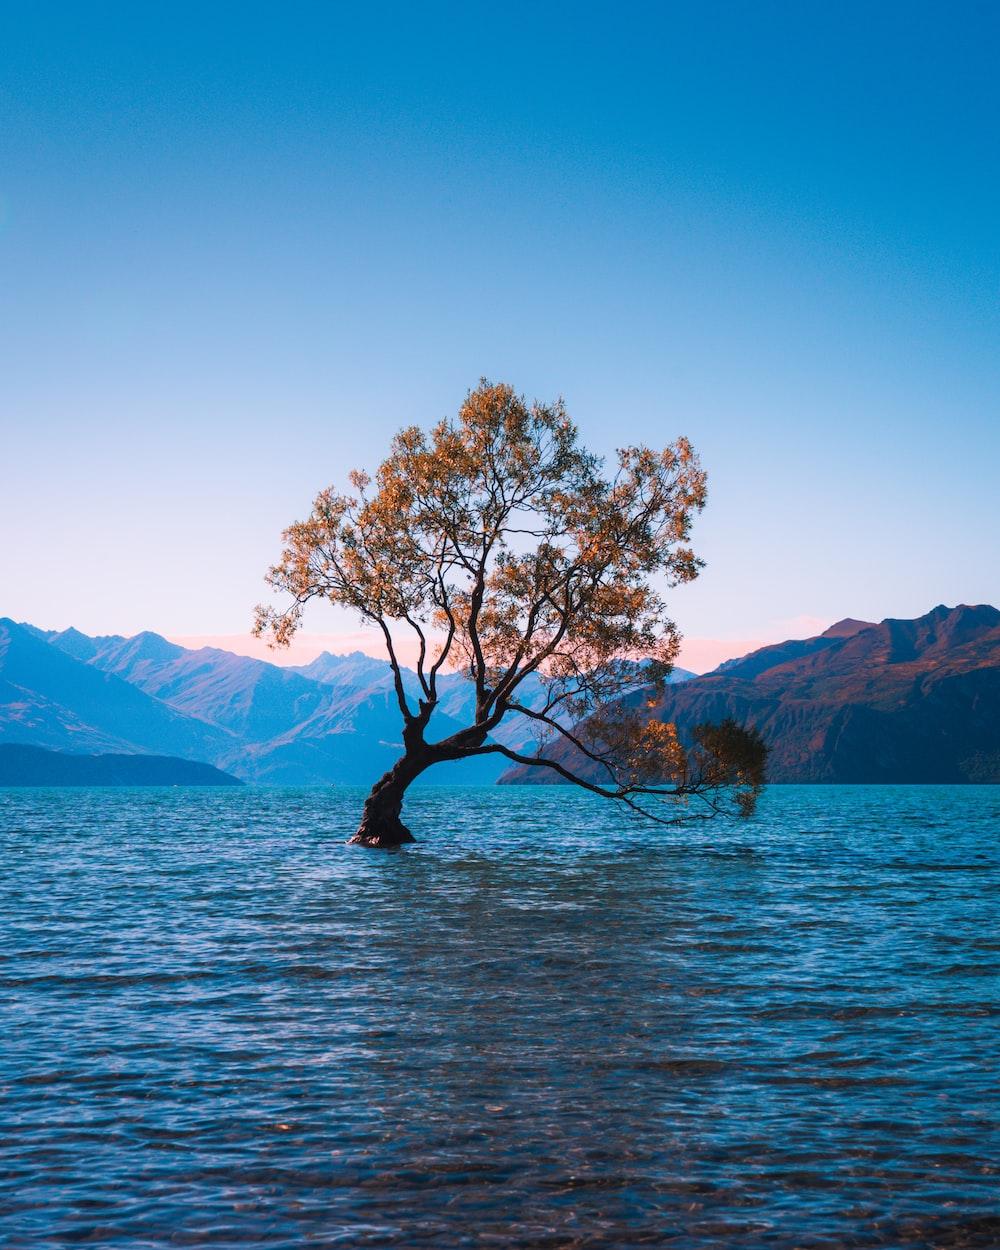 brown leaf tree at water during daytime